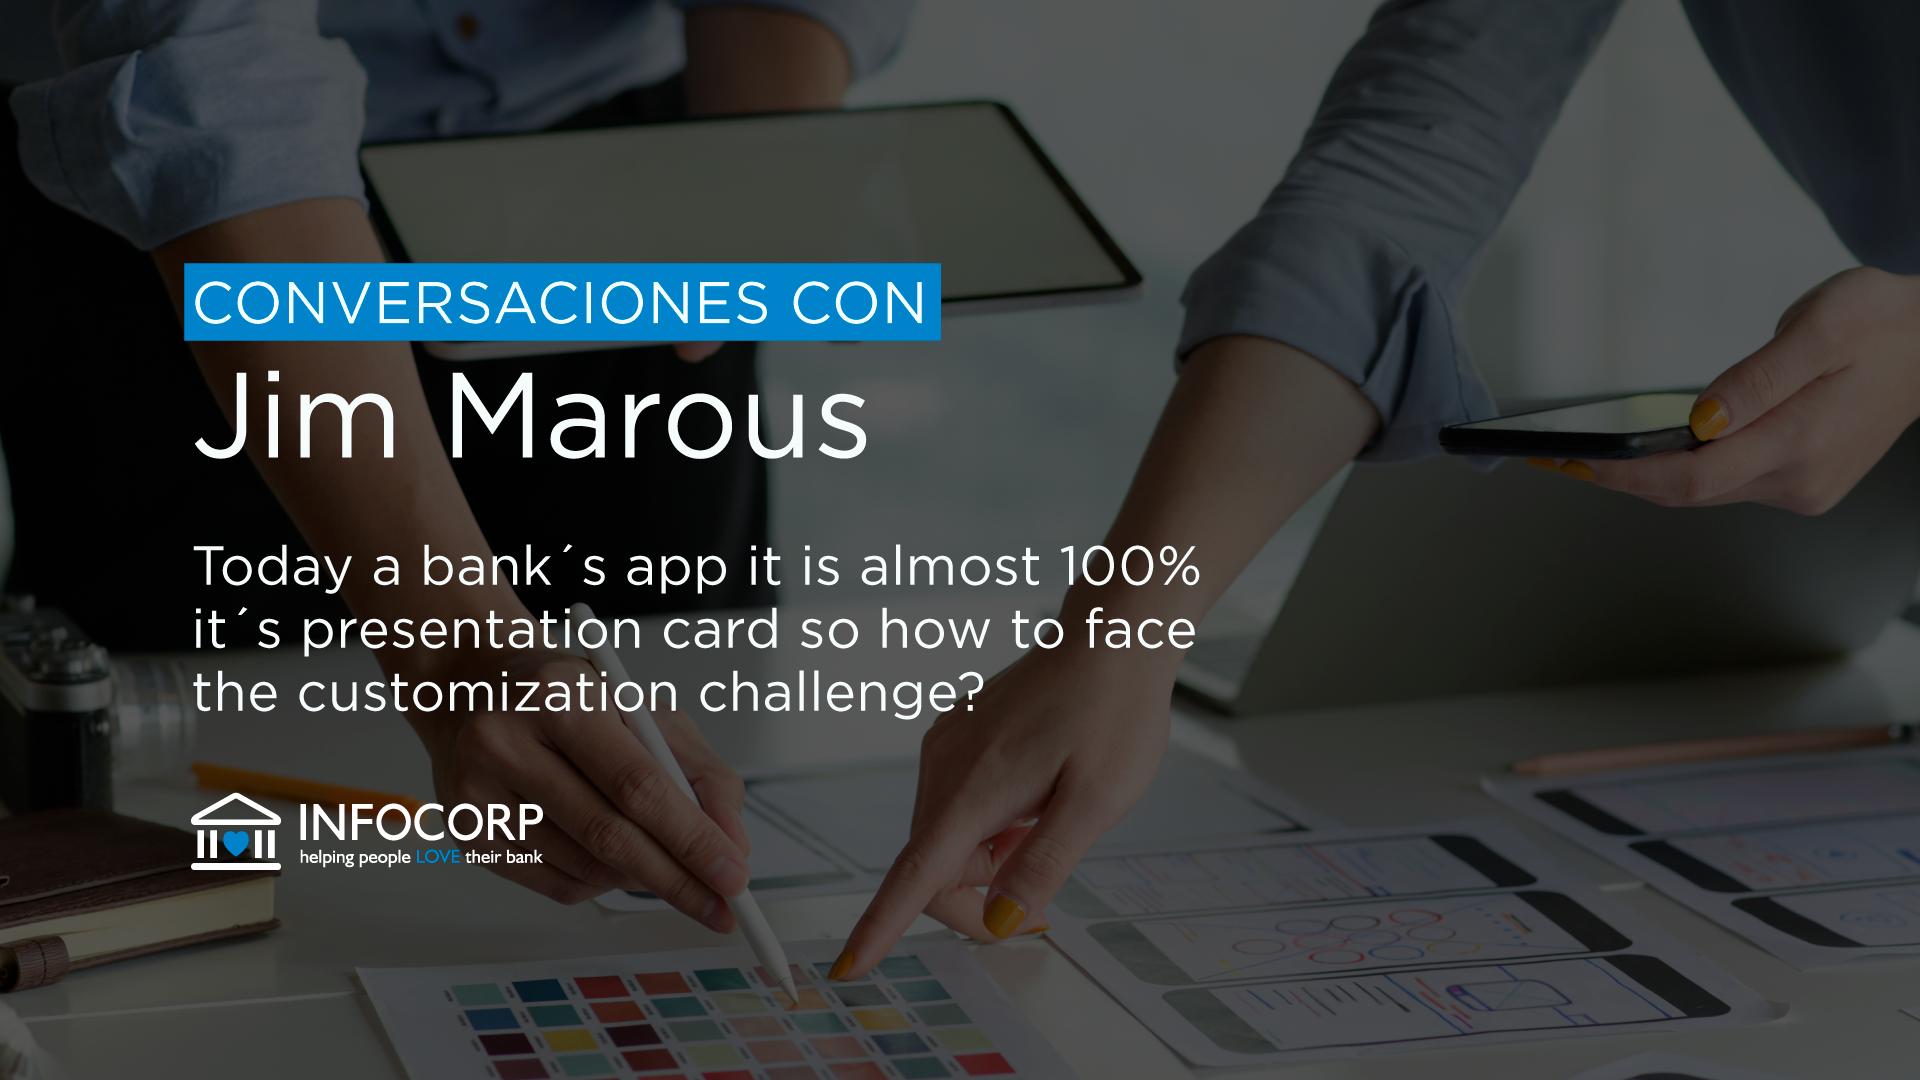 BanksApp100#Infocorp - Corte 3